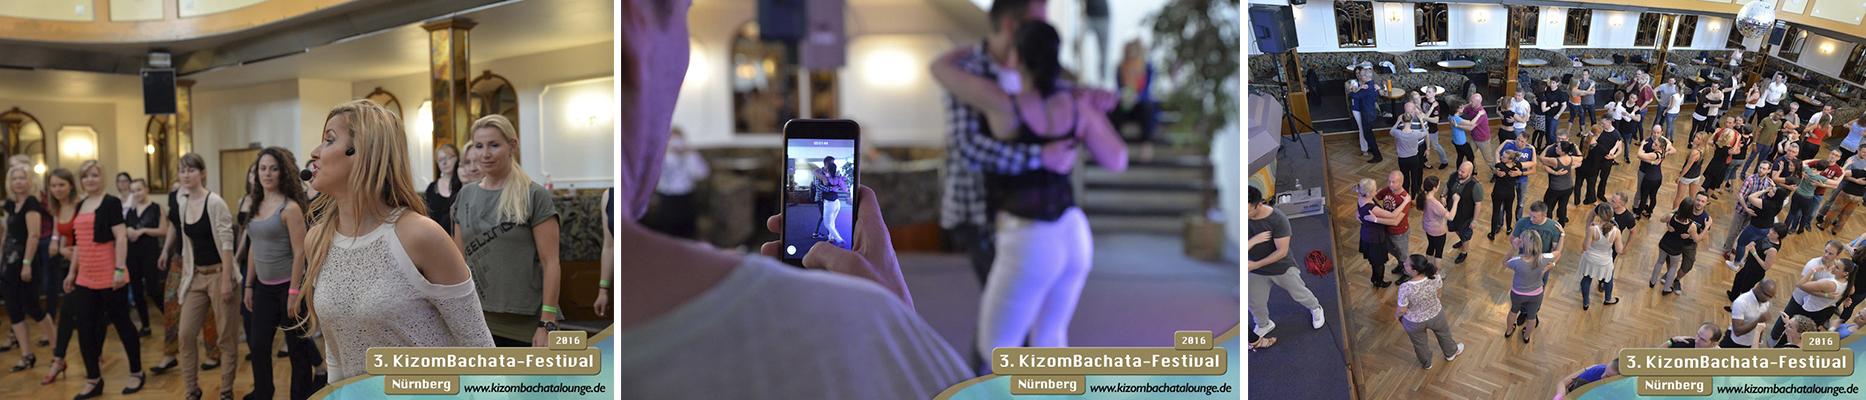 KizomBachata_Festival_Fuerth_Nuernberg_2